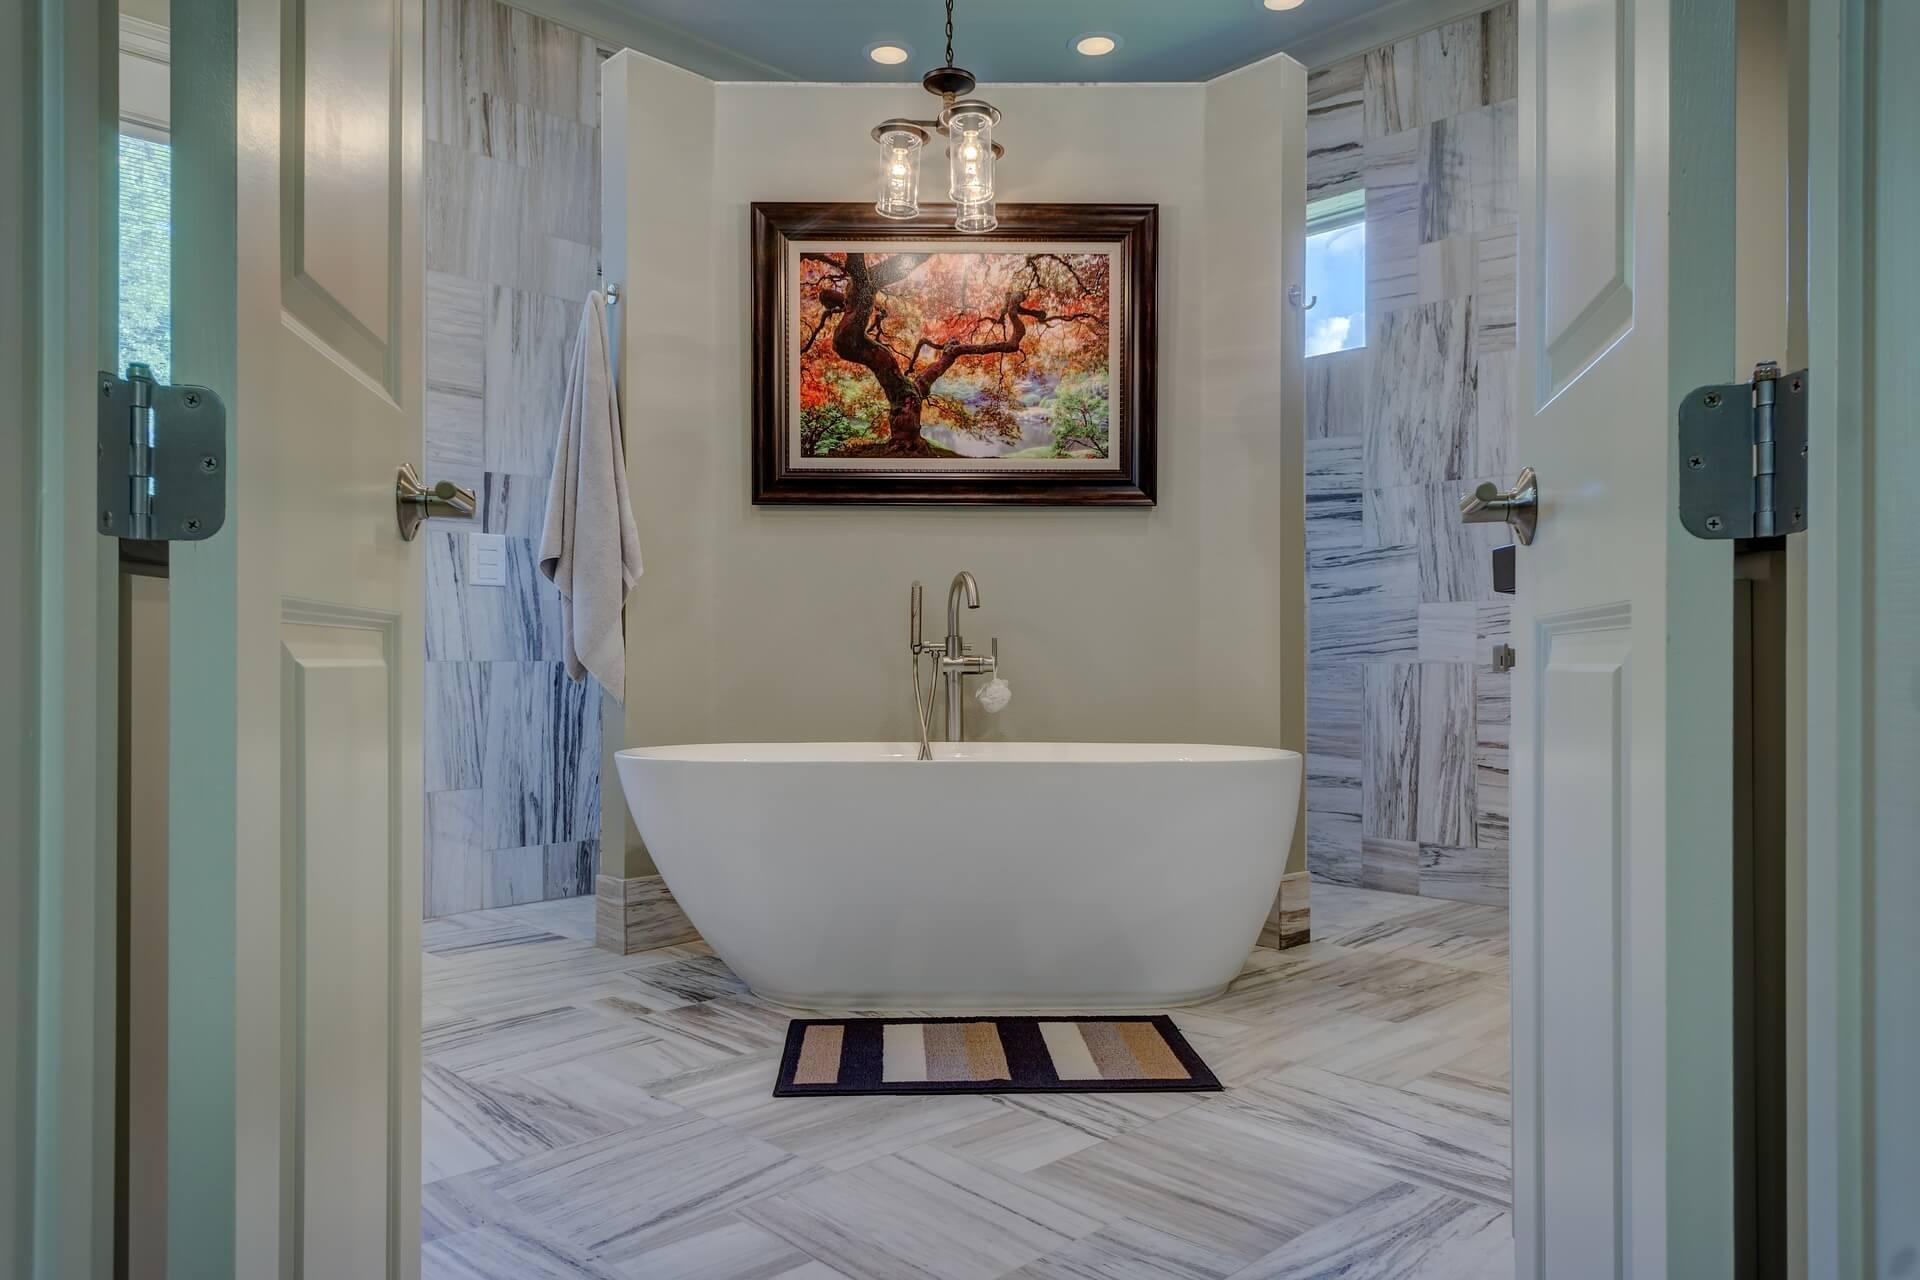 Funky Bathroom 10 Small But Funky Bathroom Designs Interior Design Design News